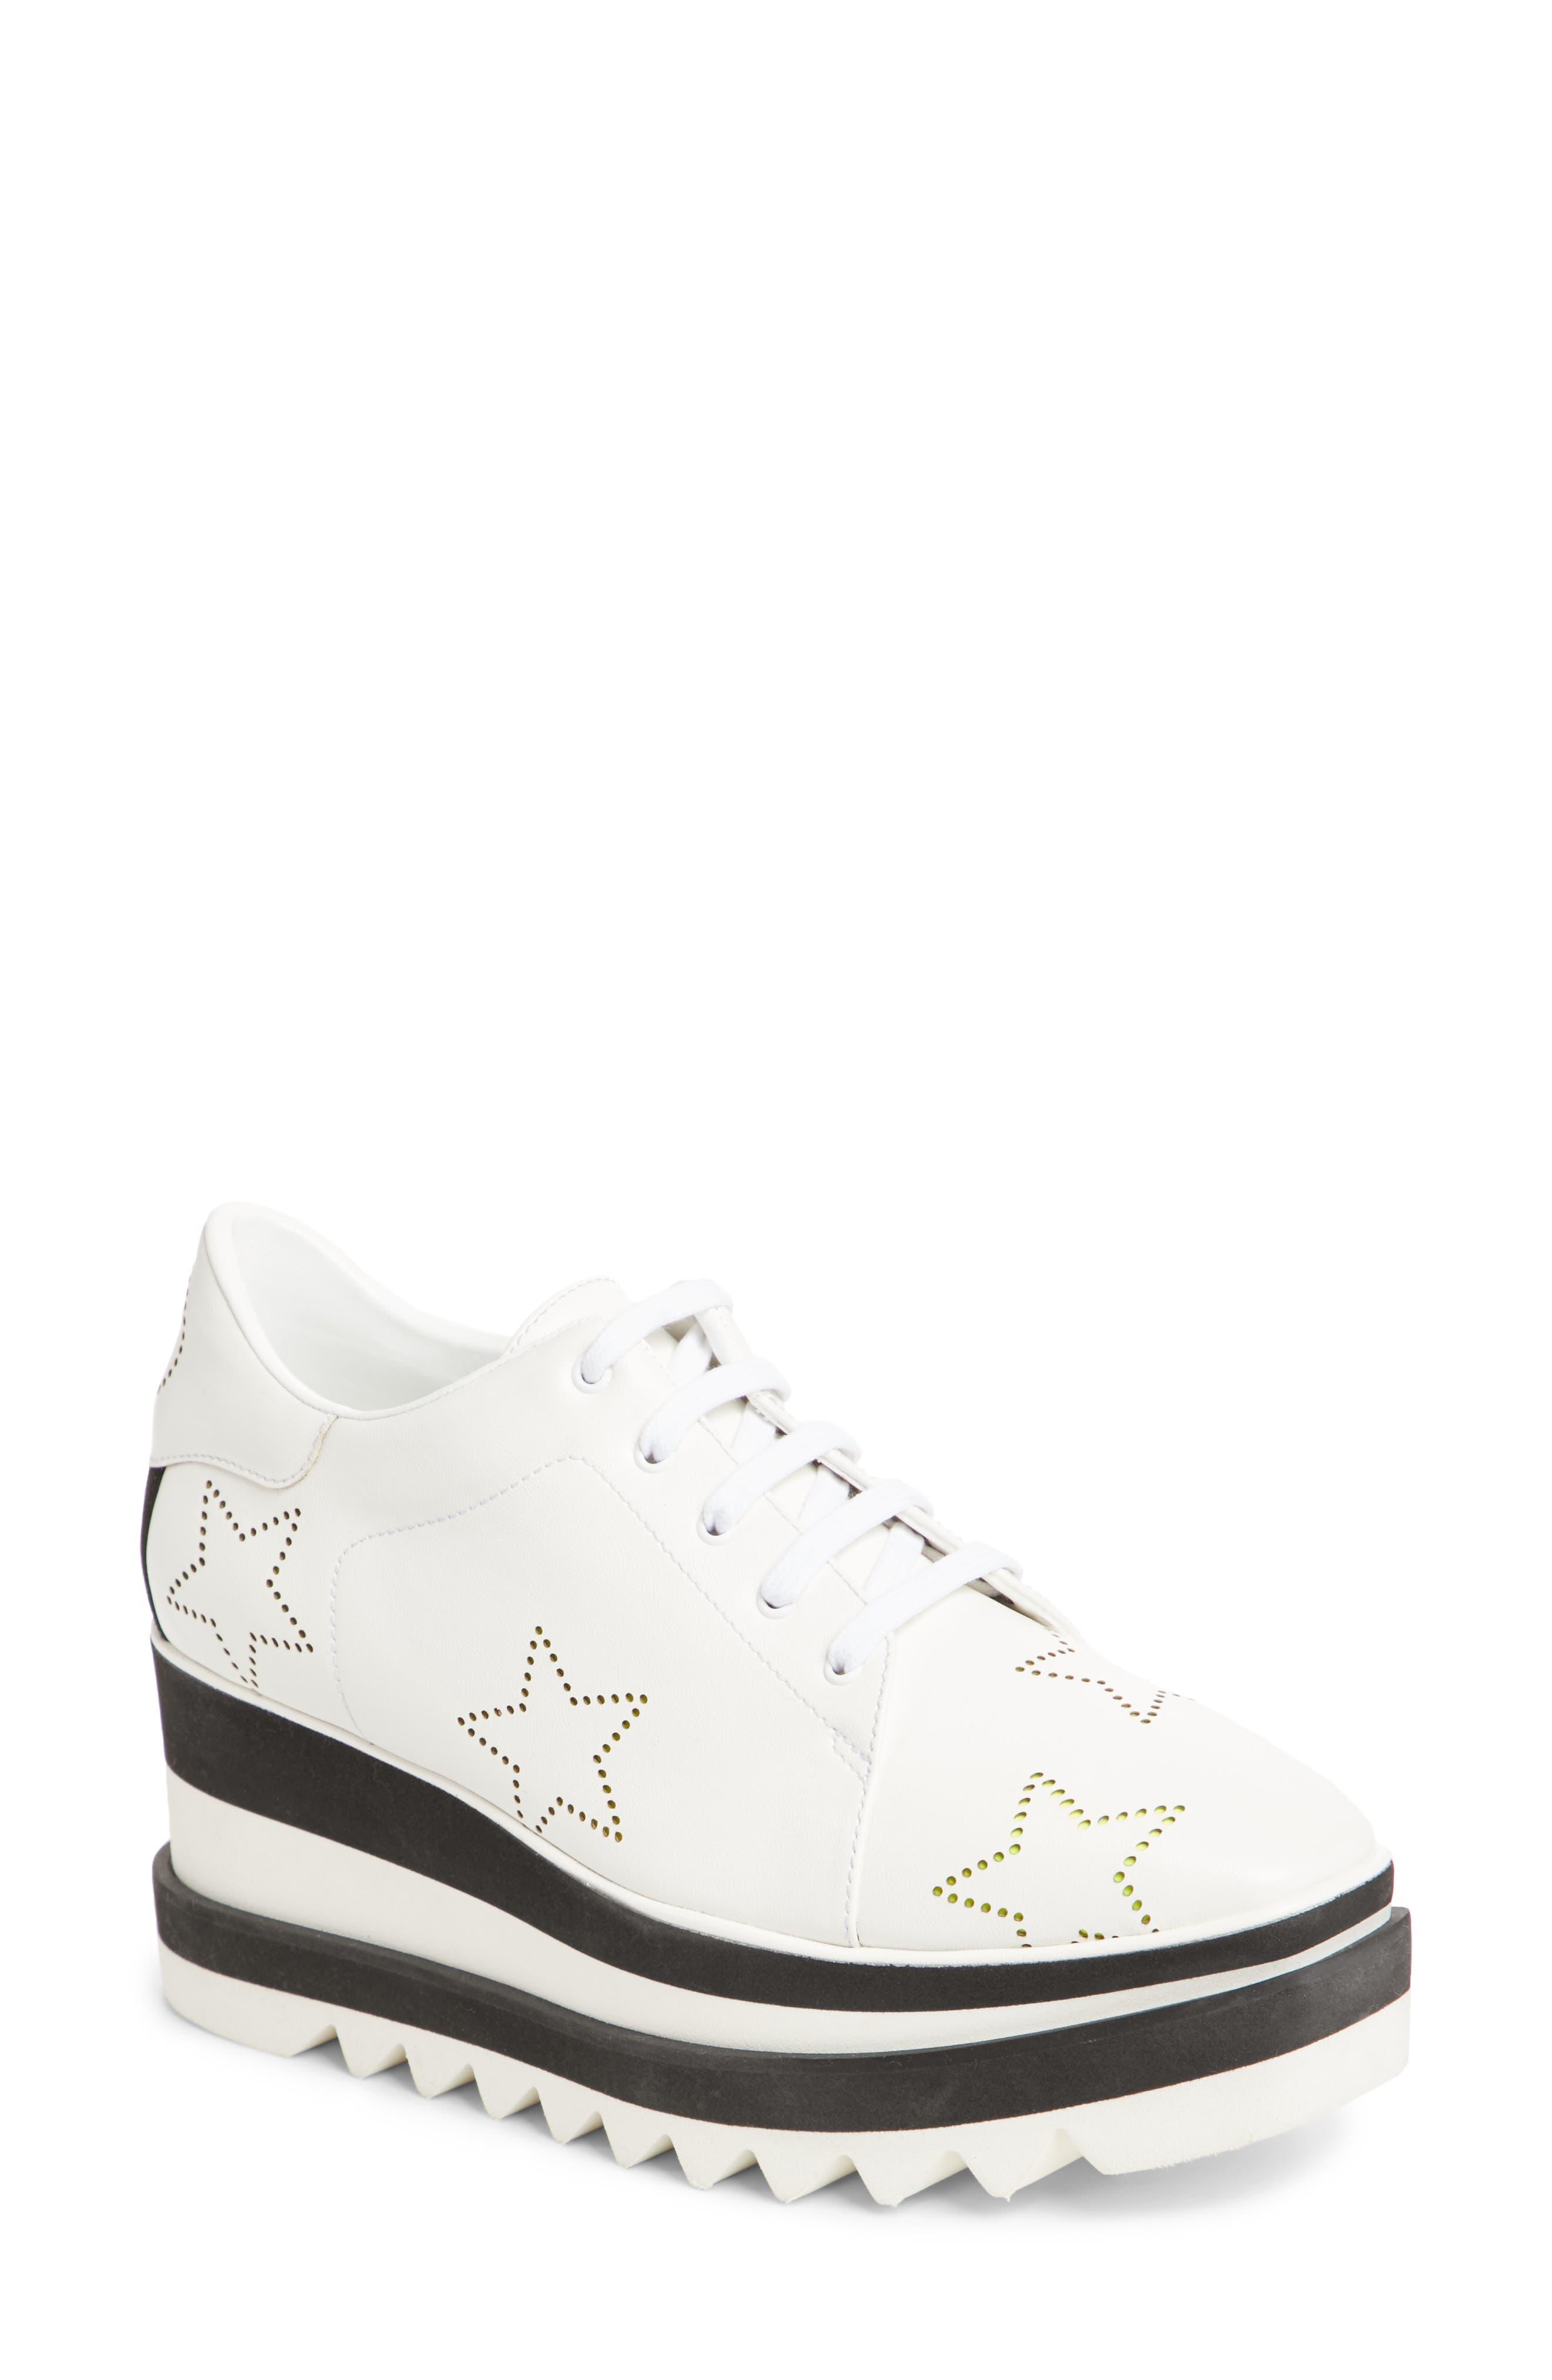 Elyse Platform Sneaker,                         Main,                         color, White